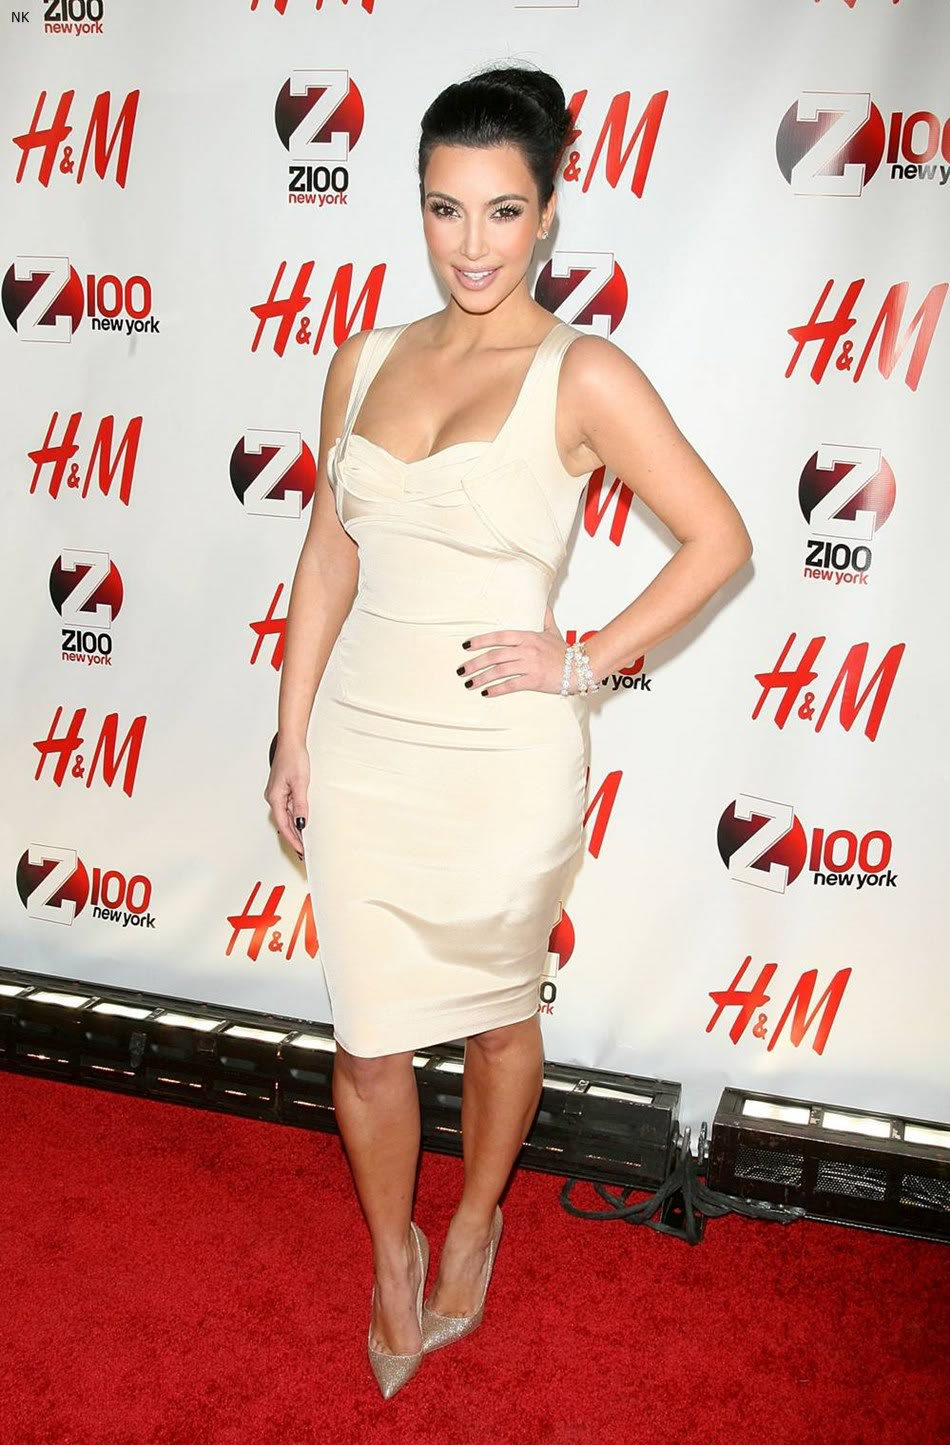 http://1.bp.blogspot.com/-kWoZUndYpDs/TbS5aBQiThI/AAAAAAAADwU/Gn5VBHWNi1M/s1600/kim_kardashian_dress.jpg